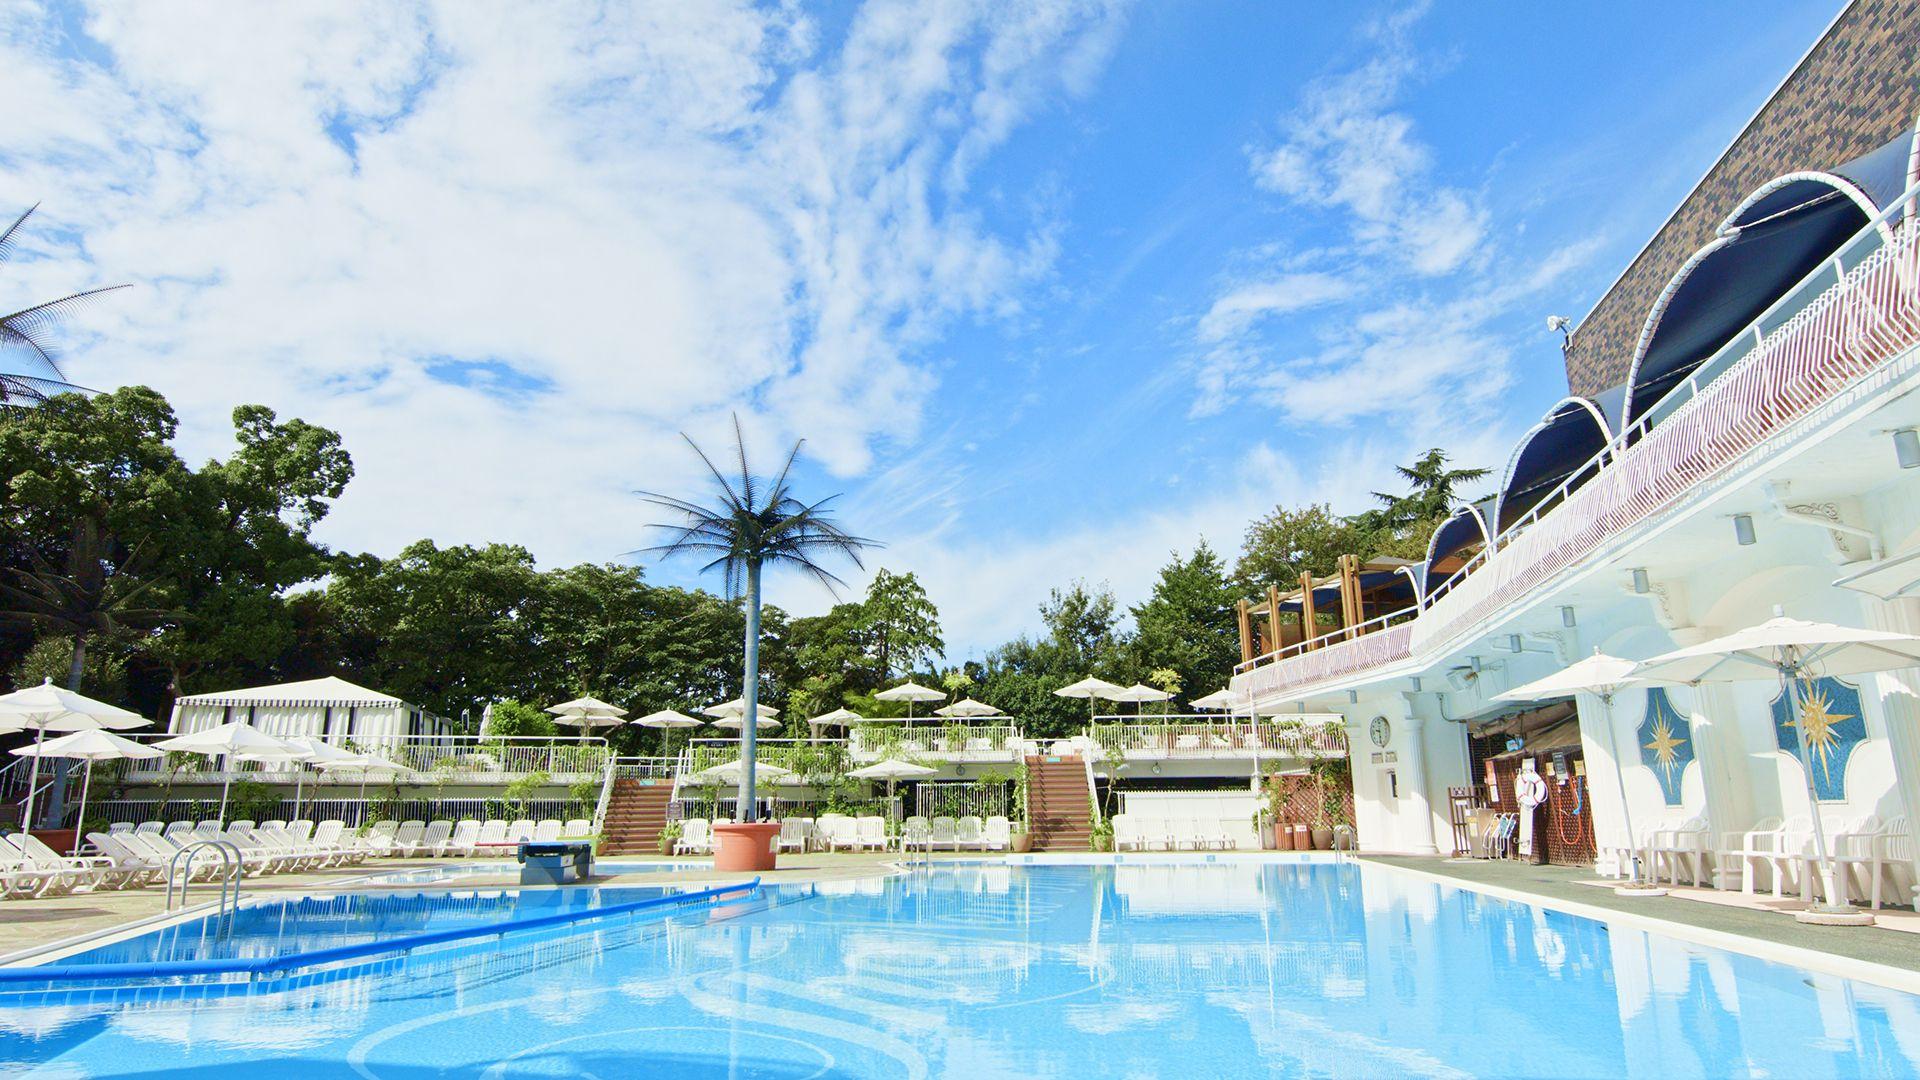 location hotel new otani tokyo. Black Bedroom Furniture Sets. Home Design Ideas